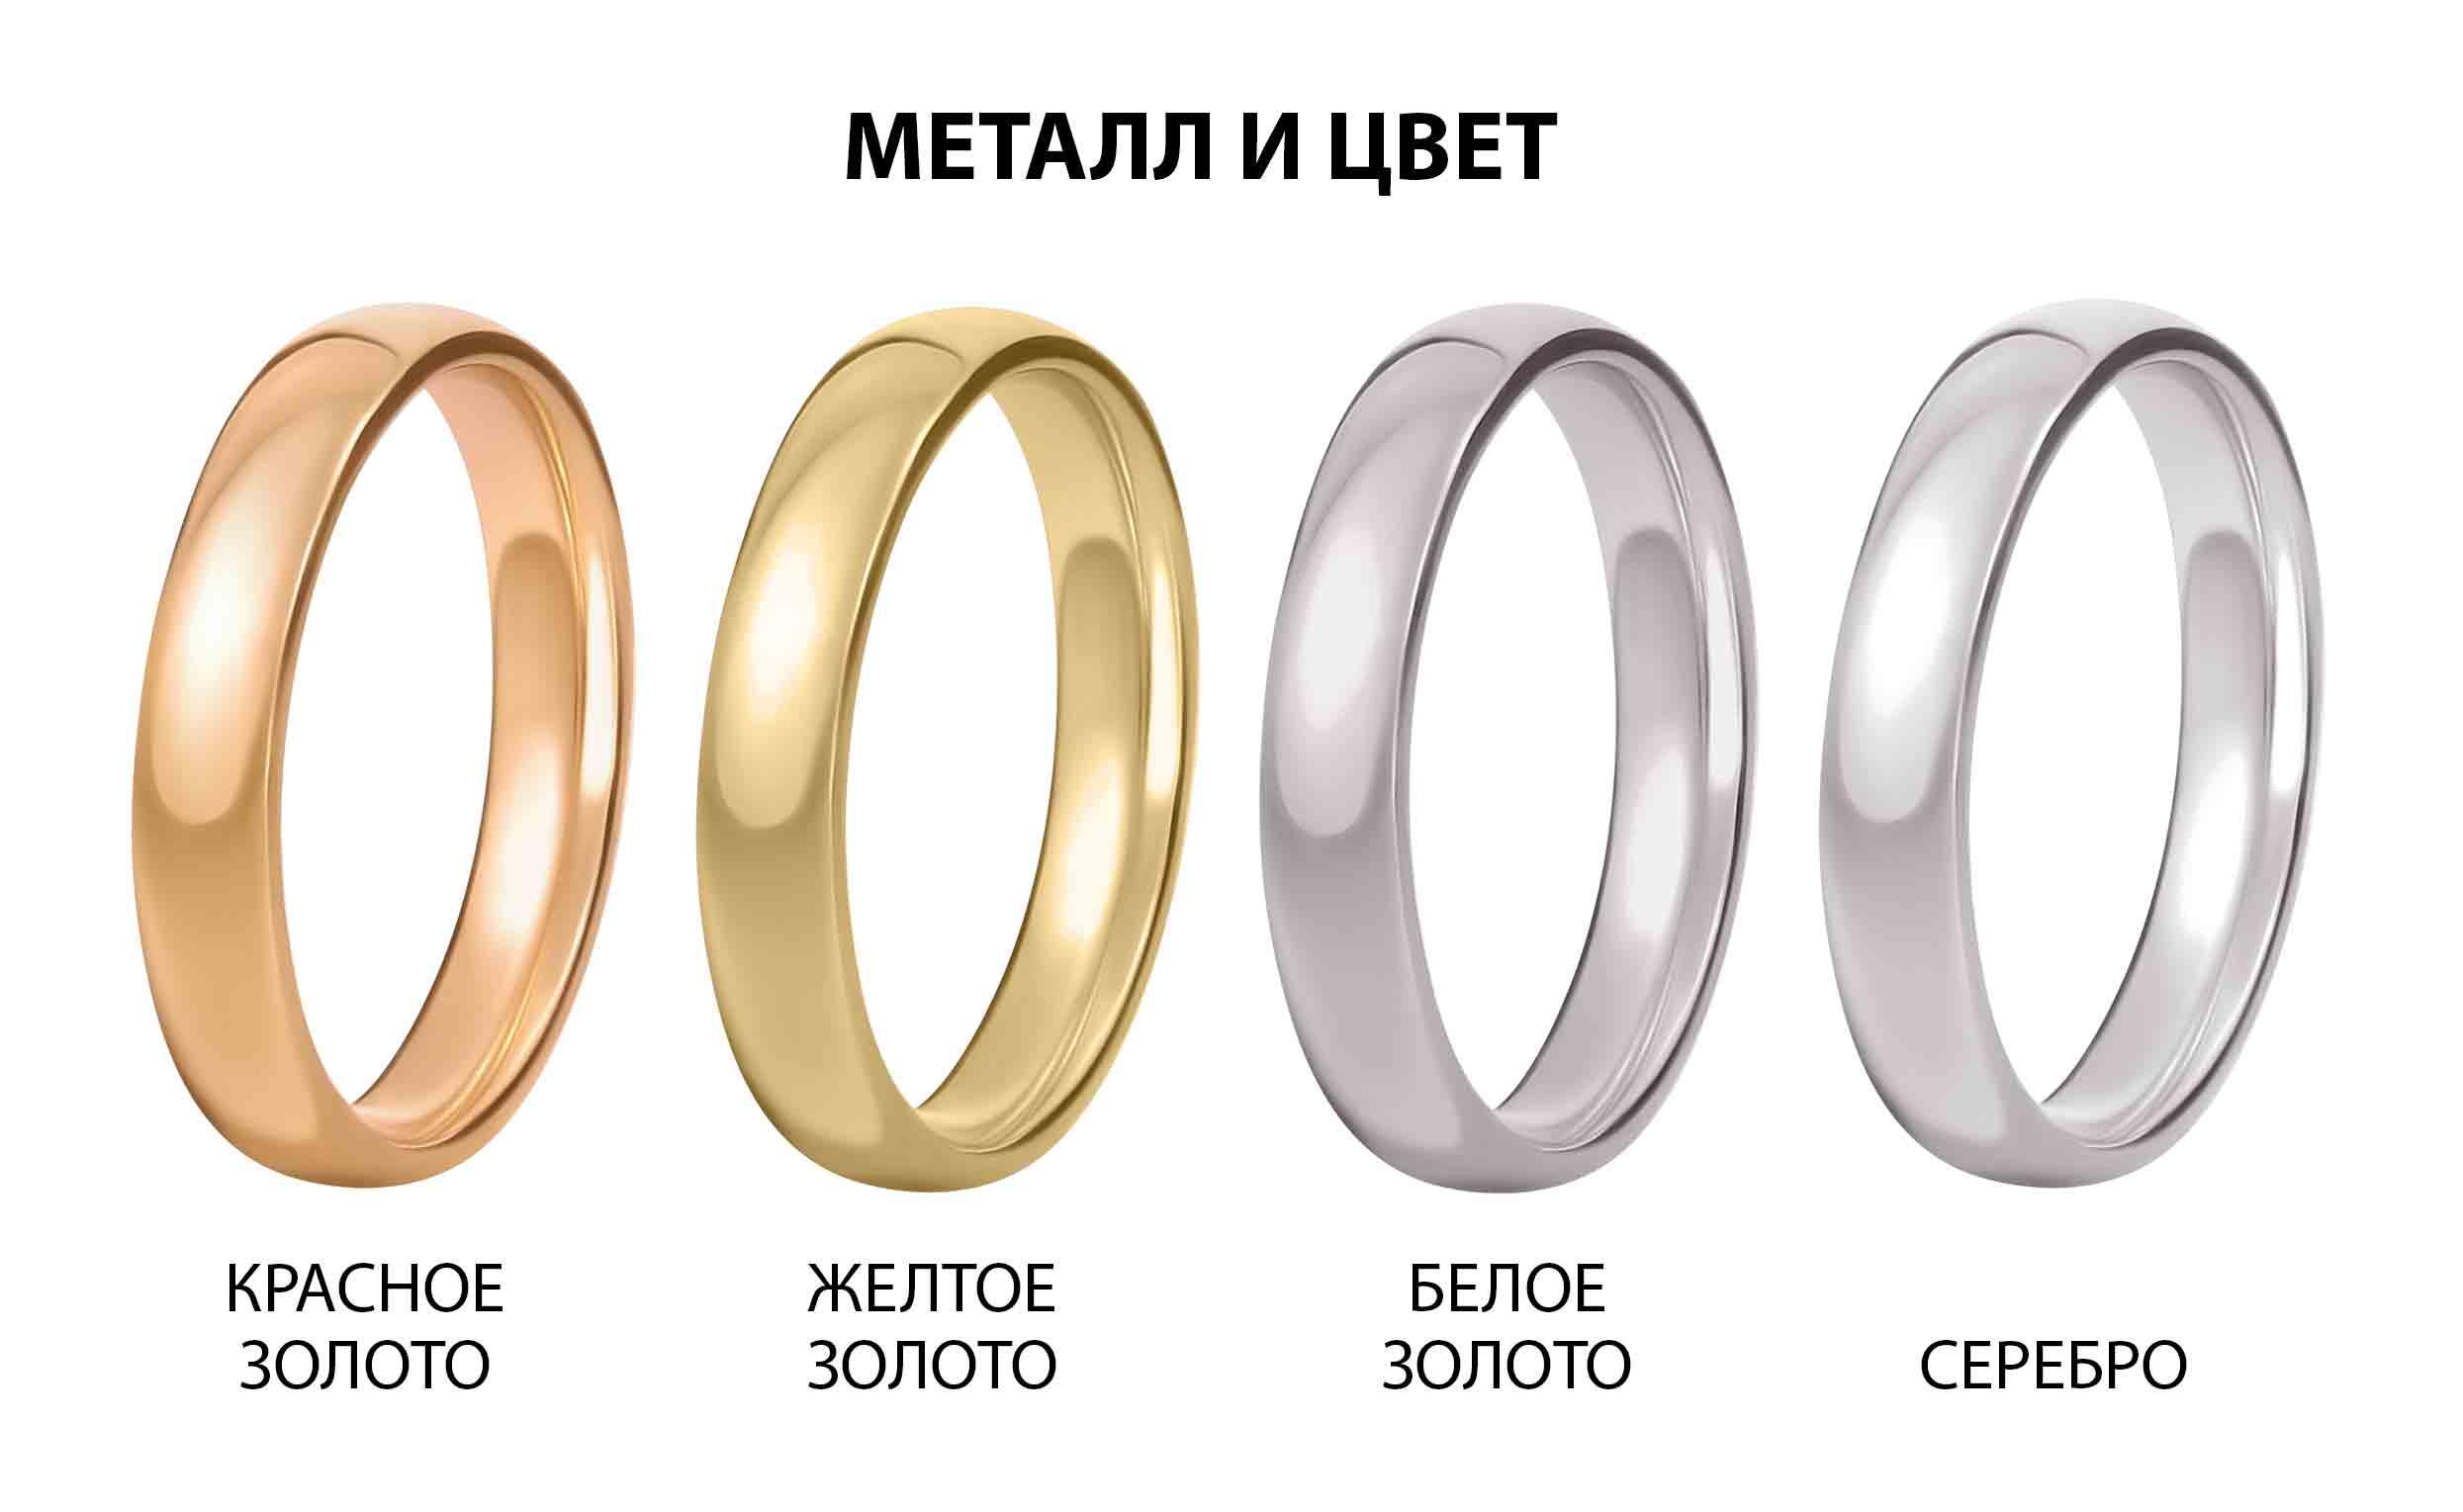 vubor-metalla-i-ego-tsveta-ru